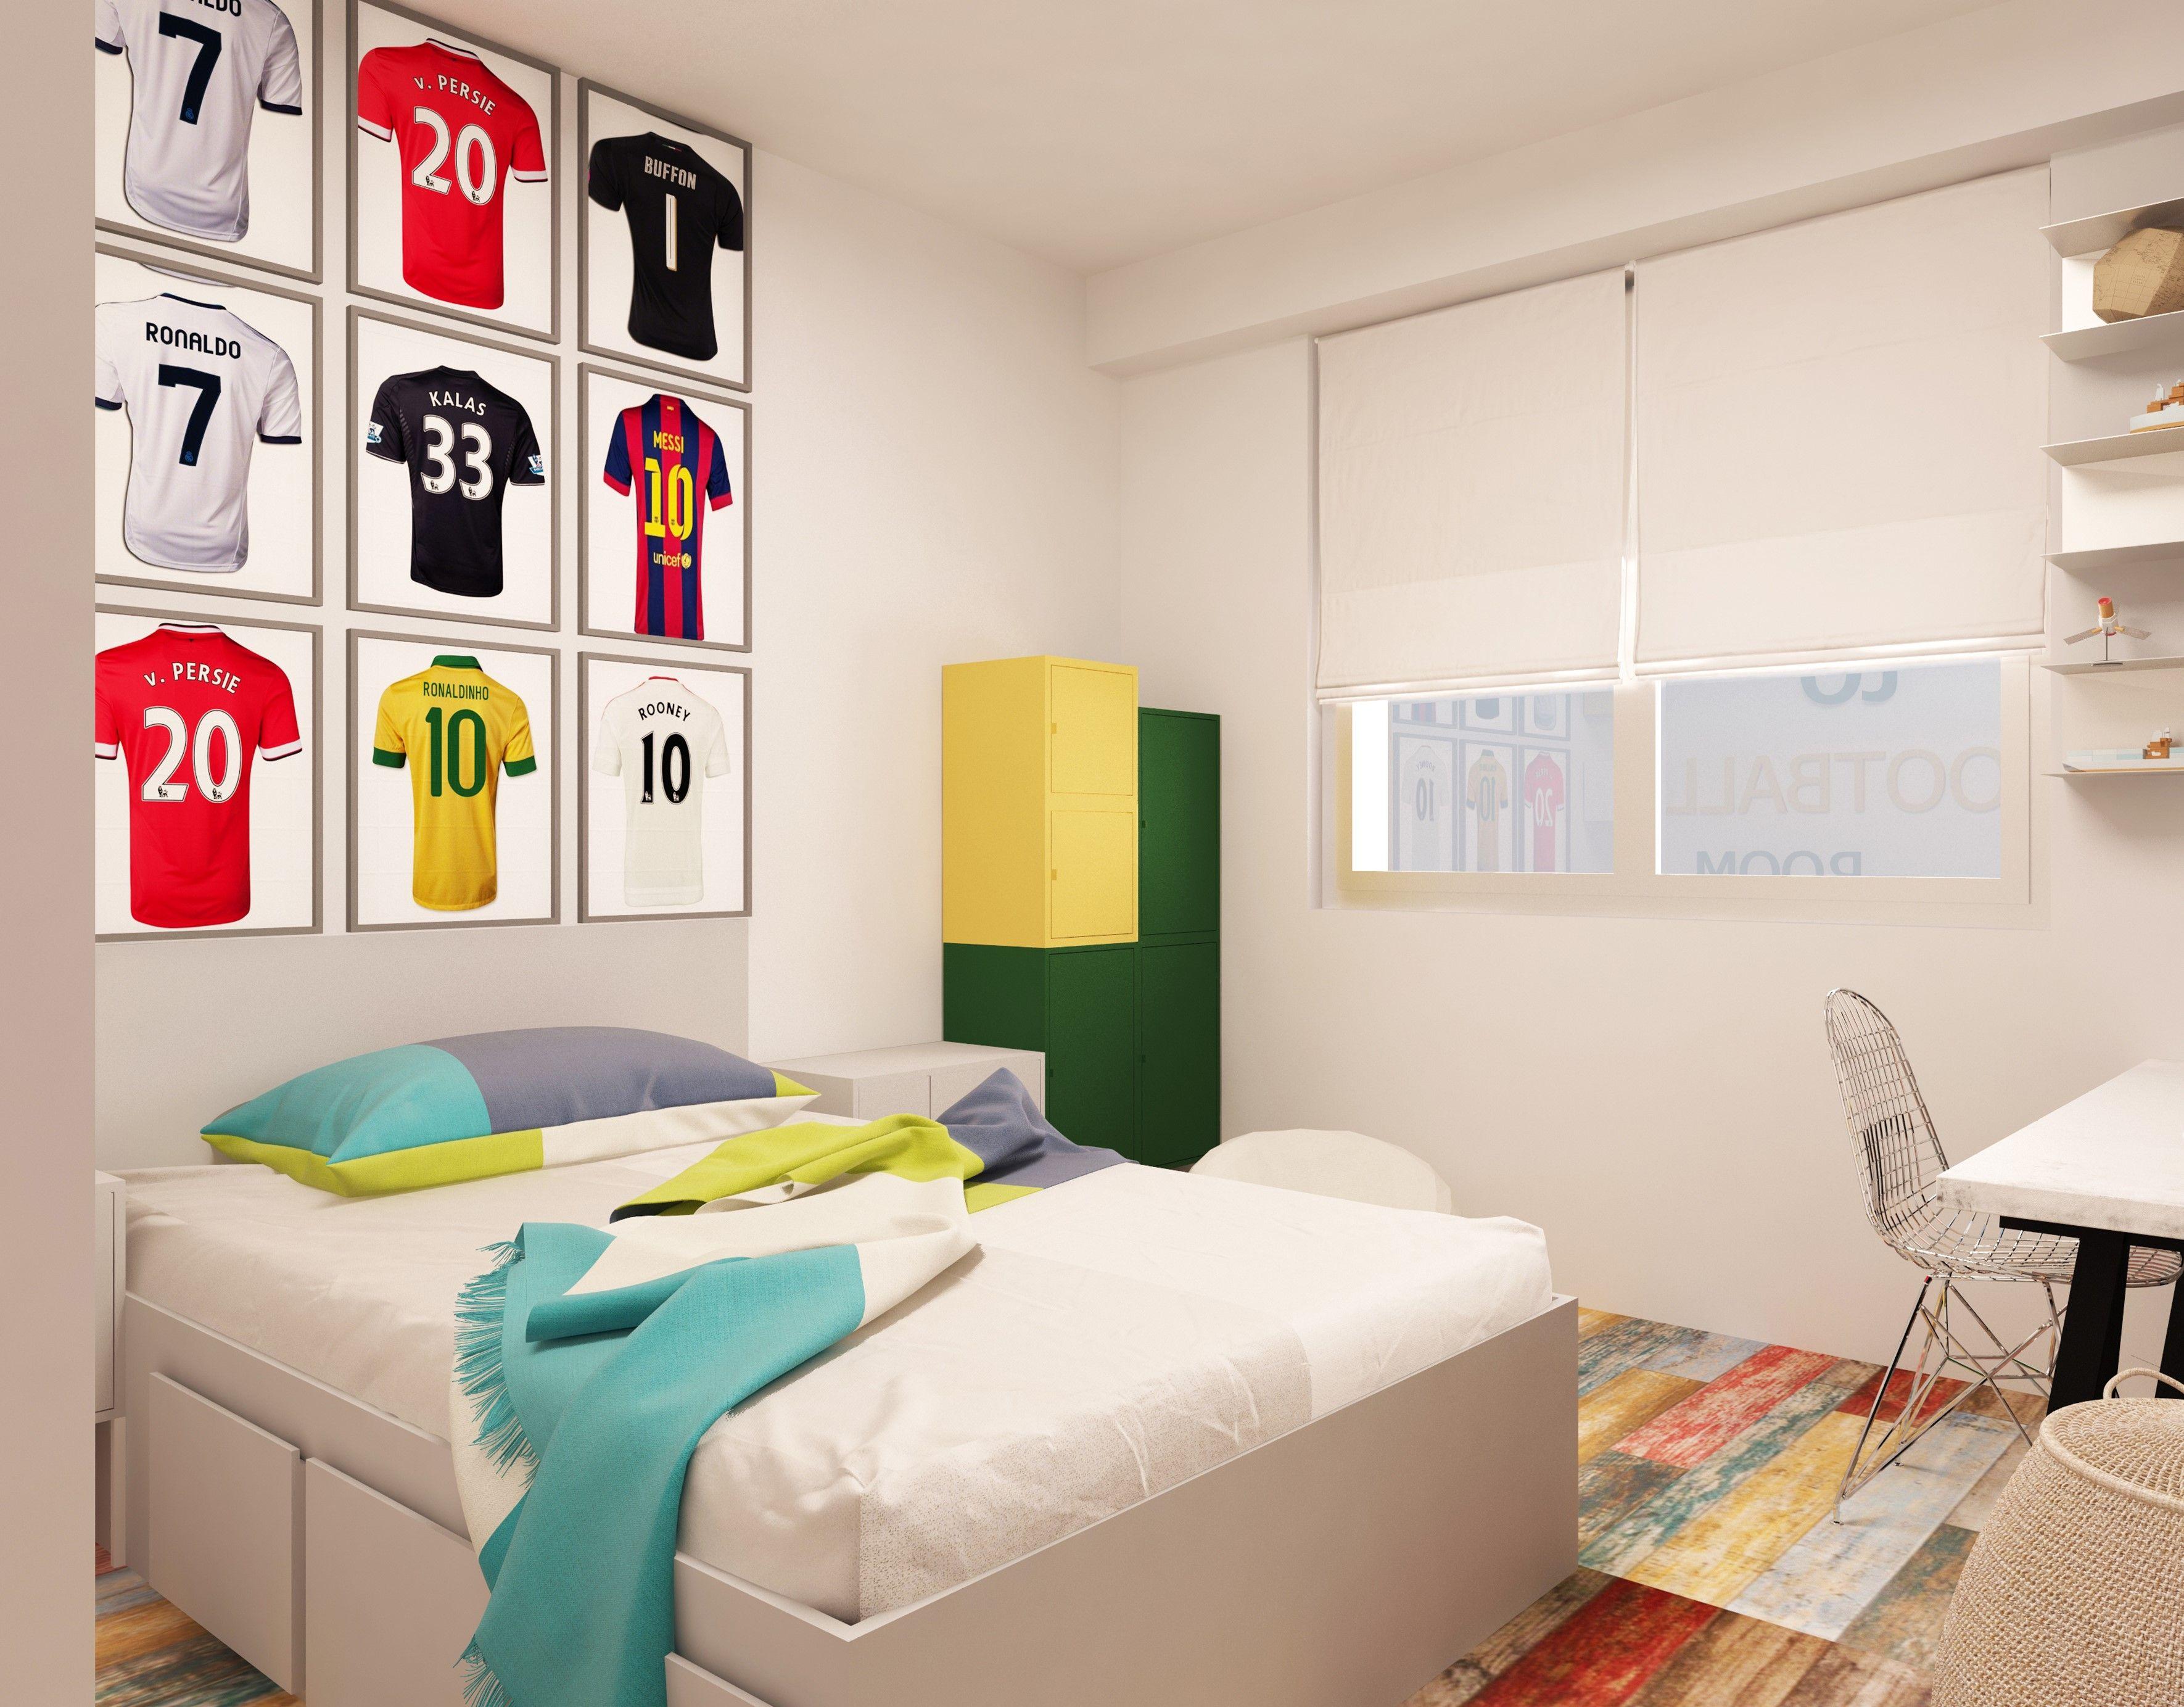 interiordesign #cyan #bedroom #bed #whitesheets#beige #shelves